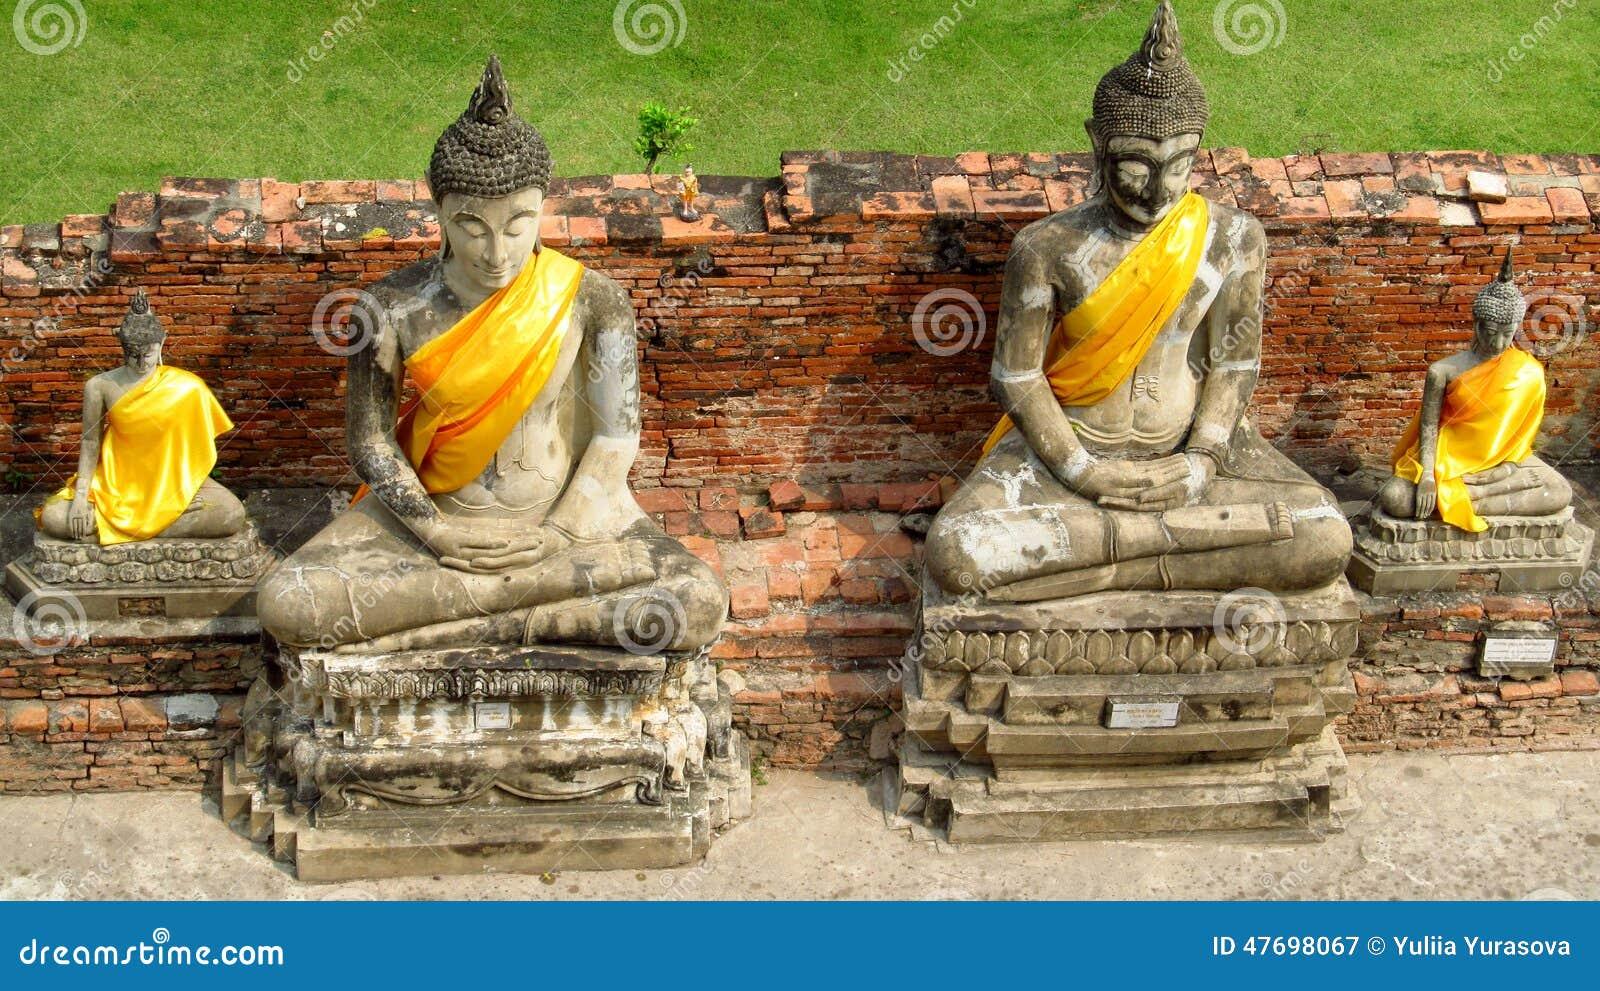 Ayutthaya Ancient City Ruins In Thailand  Buddha Statue